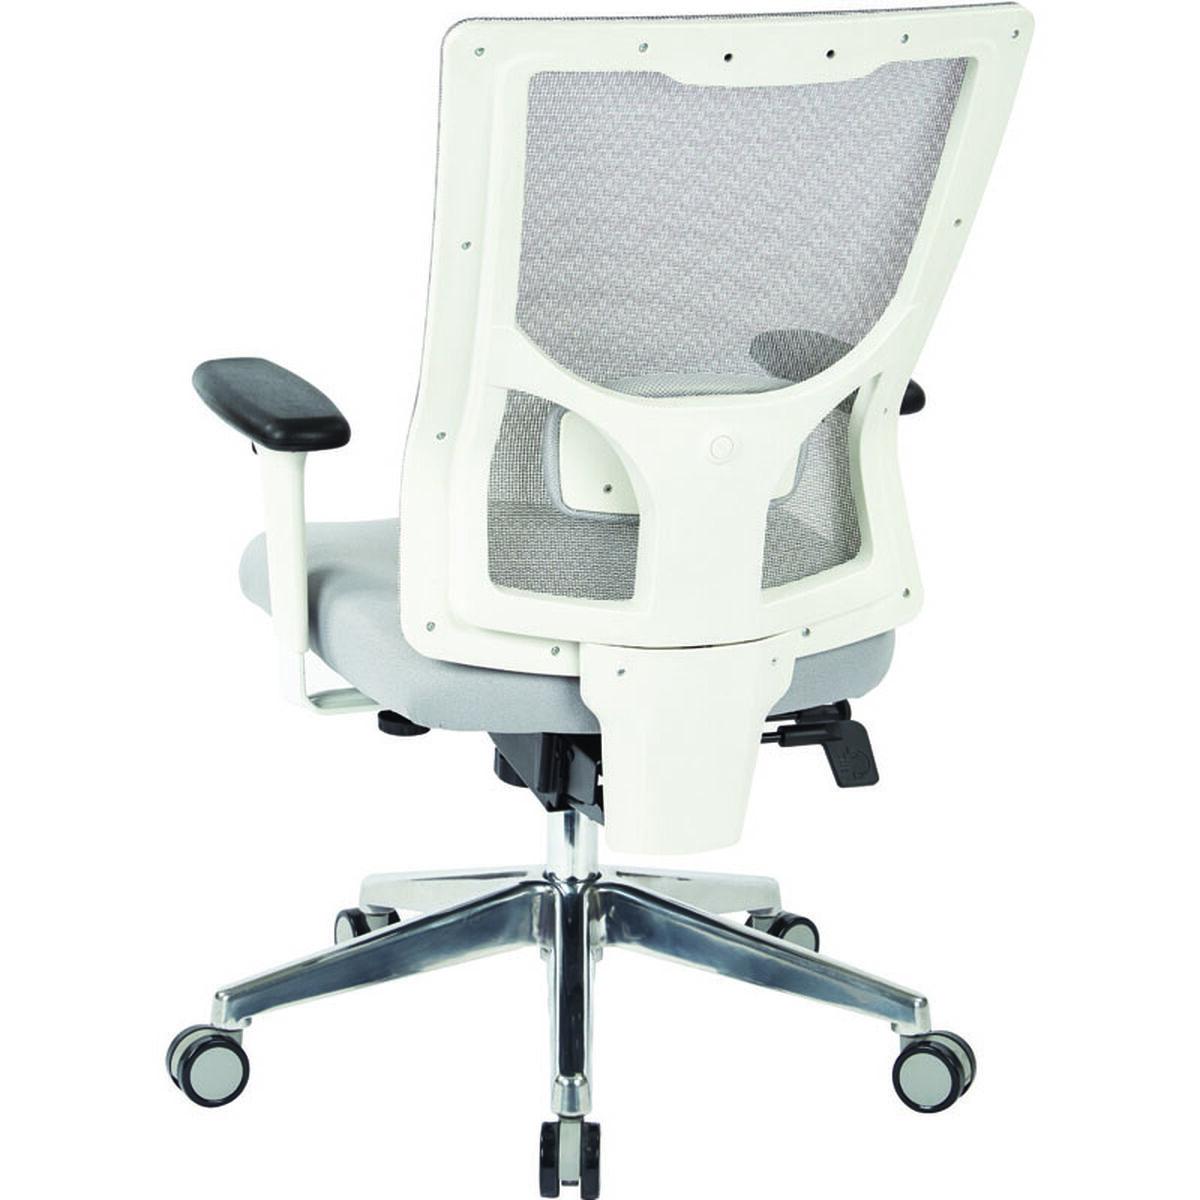 pro line ii high back chair 95672 churchchairs4less com